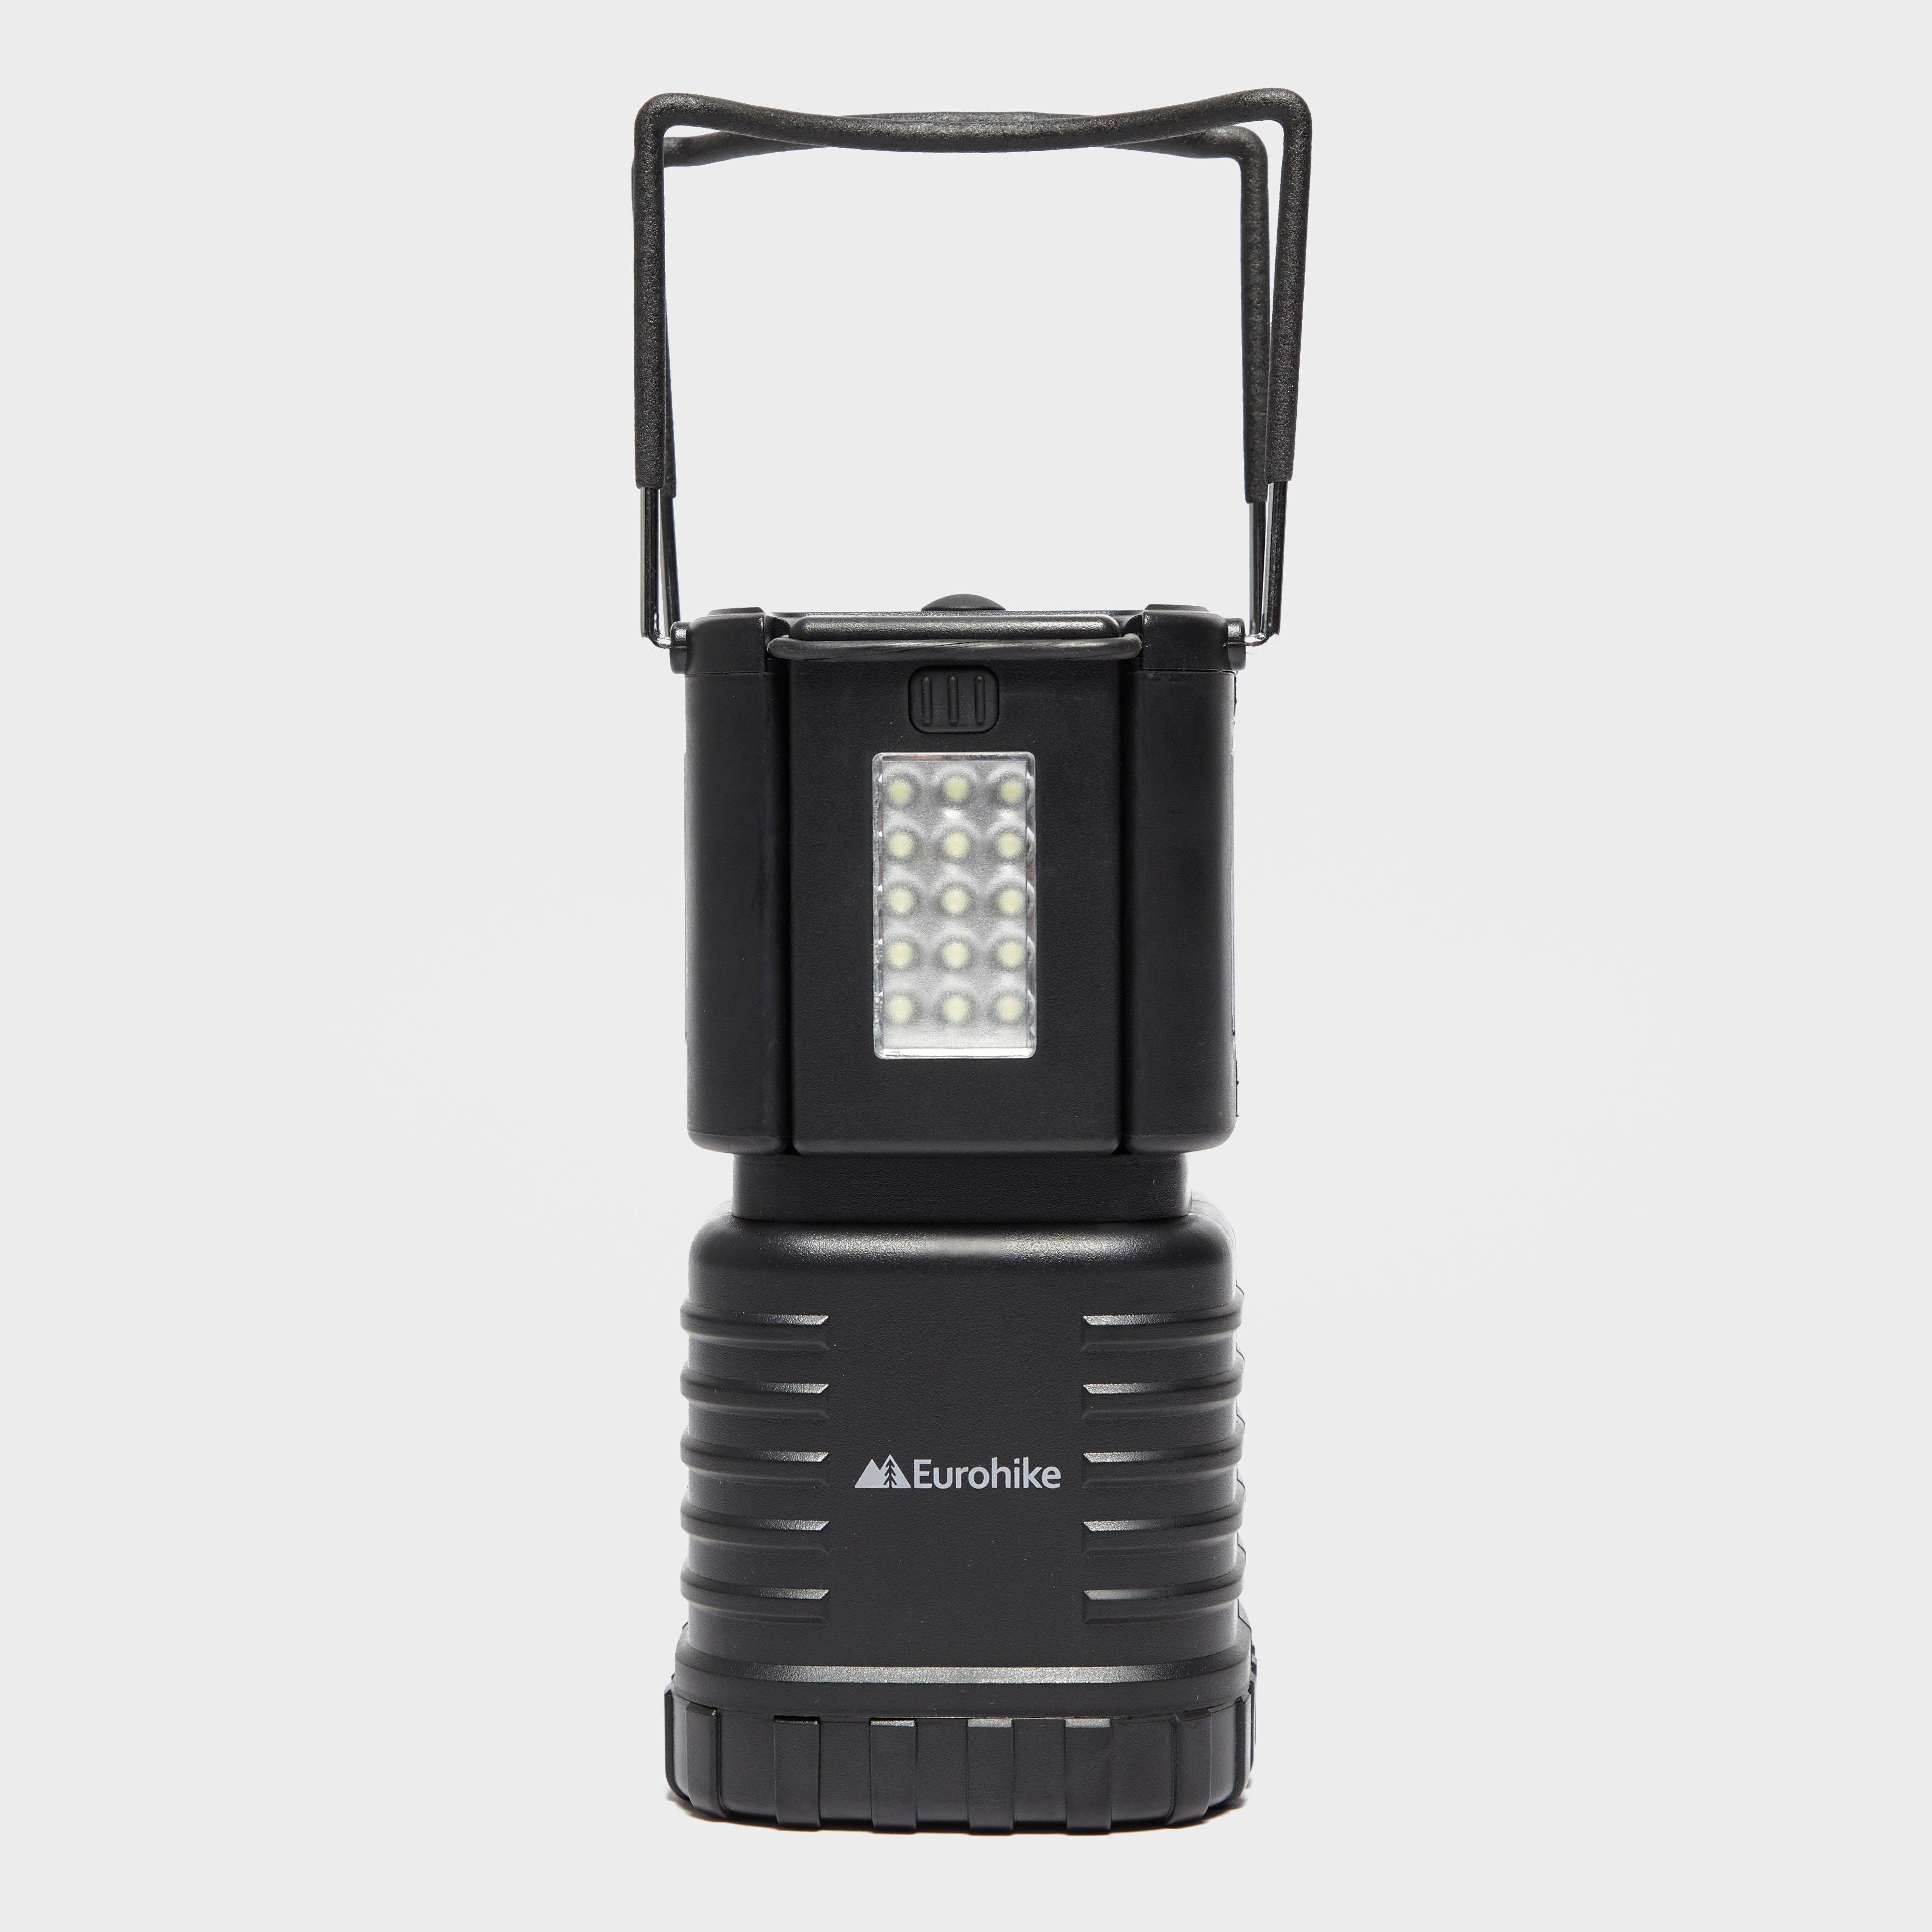 Eurohike Eurohike 66 LED Lantern + 2 Torches - Black, Black